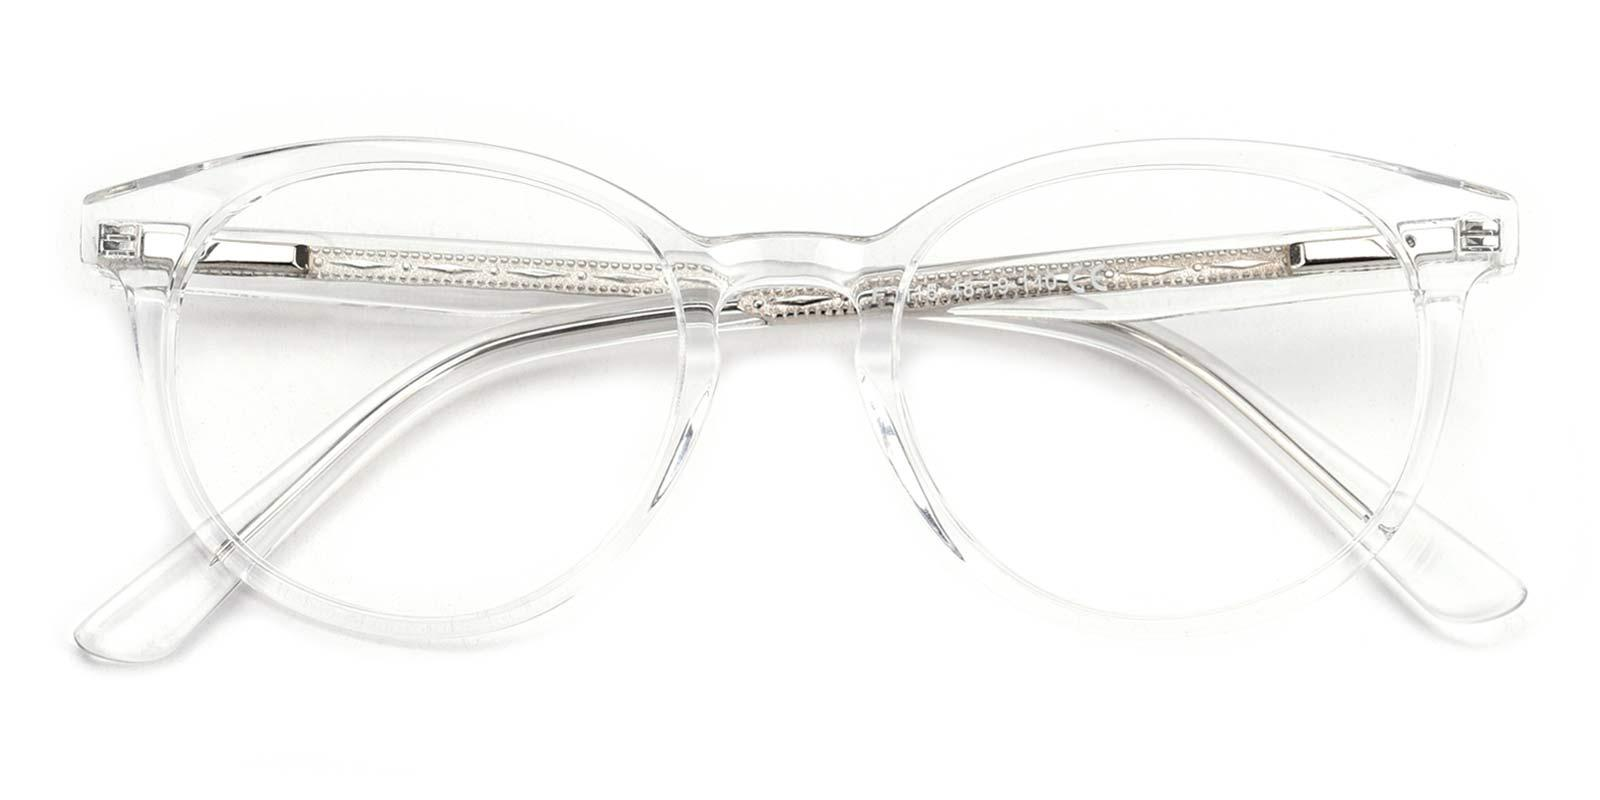 Patti-Translucent-Round-Acetate-Eyeglasses-detail